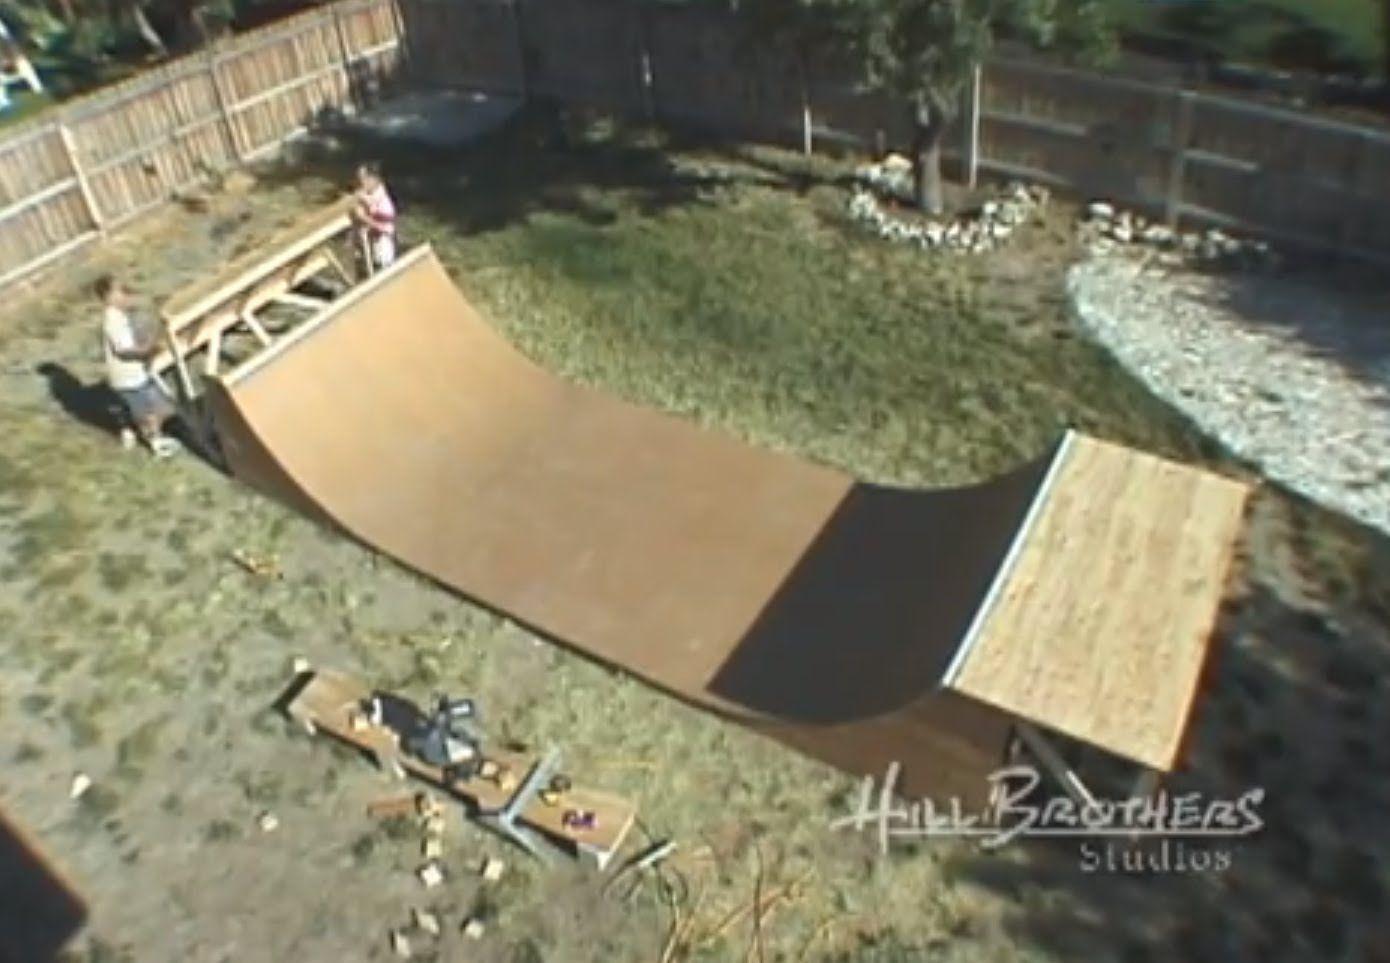 How To Build A Halfpipe Skateboard Ramp From Start To Finish Skateboard Ramps Backyard Skatepark Mini Ramp Backyard mini mega ramp